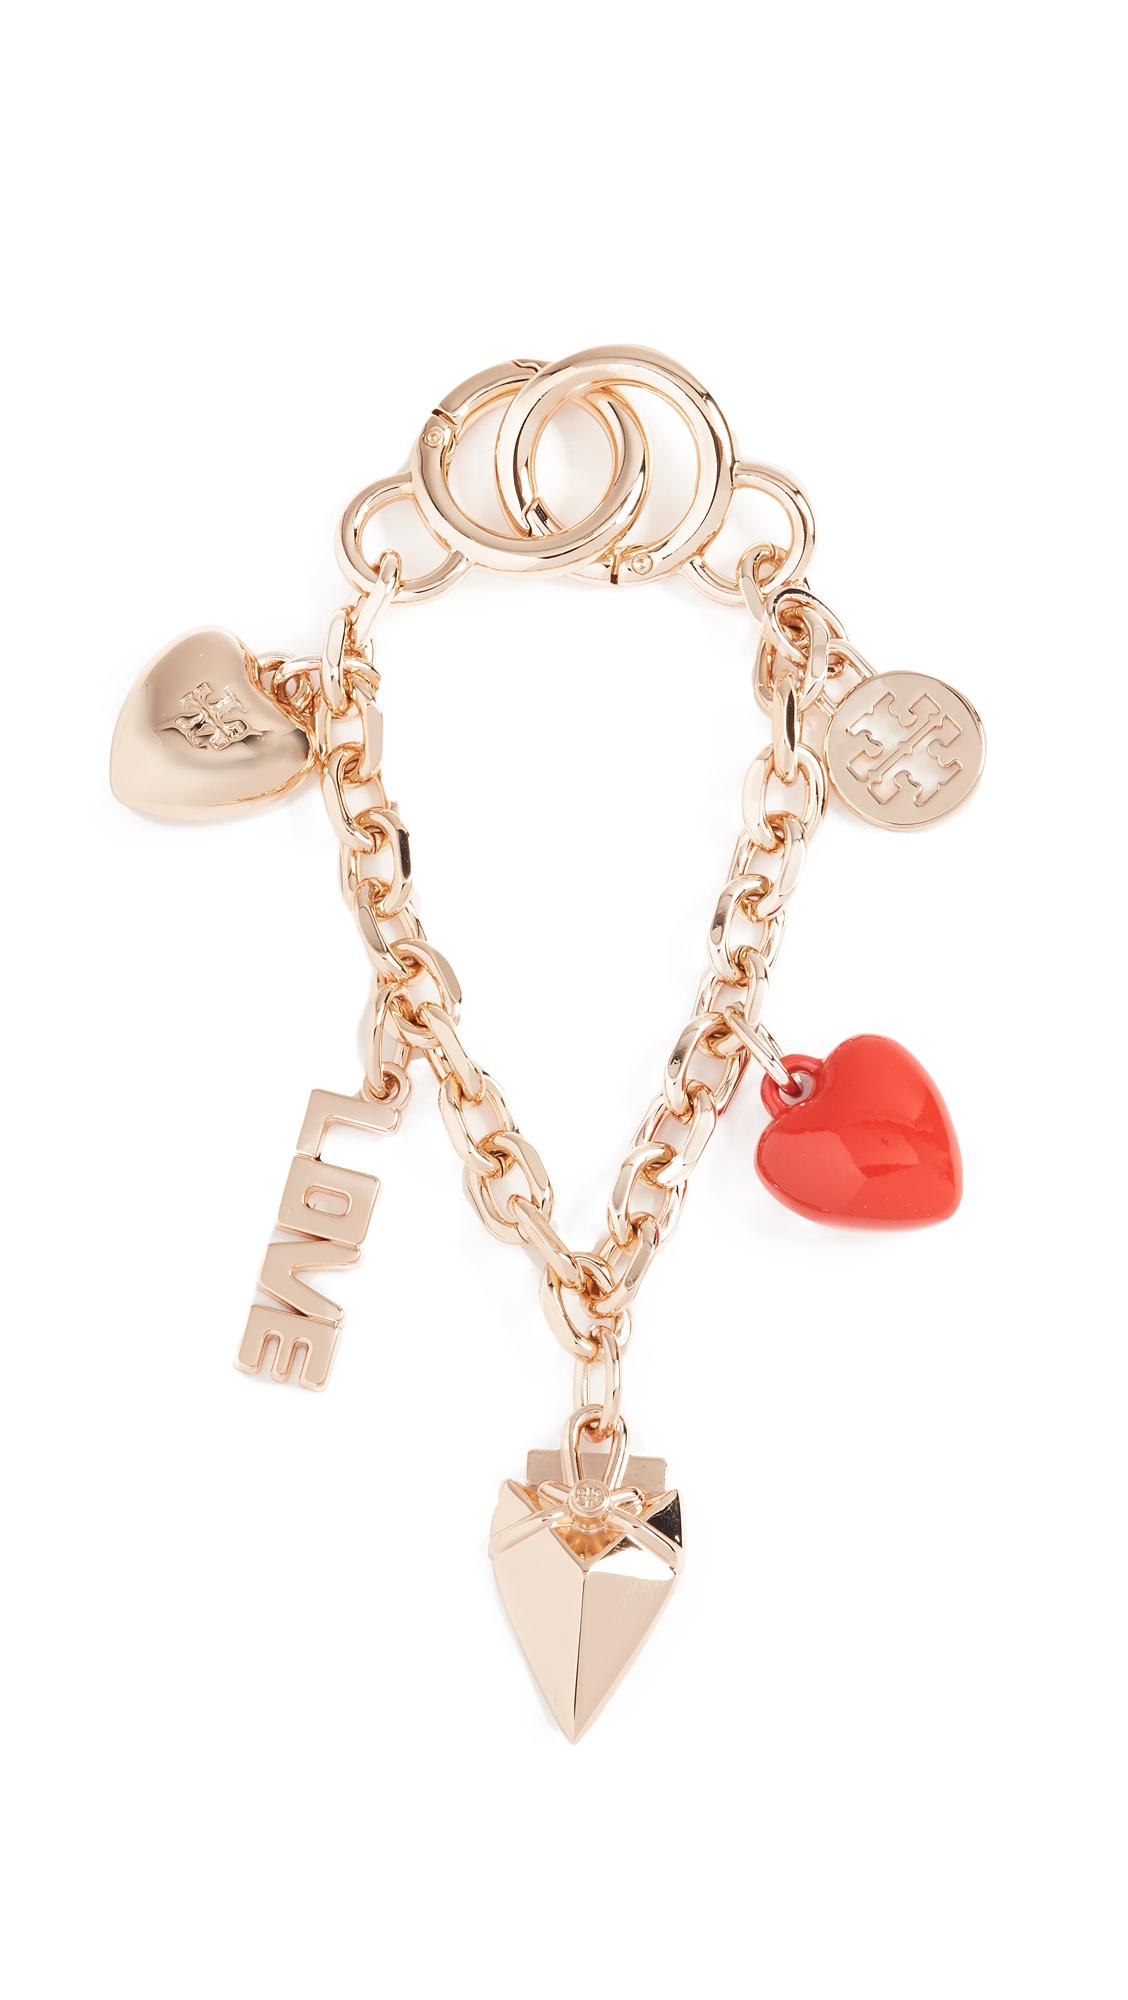 Tory Burch Heart Chain Key Chain - Gold